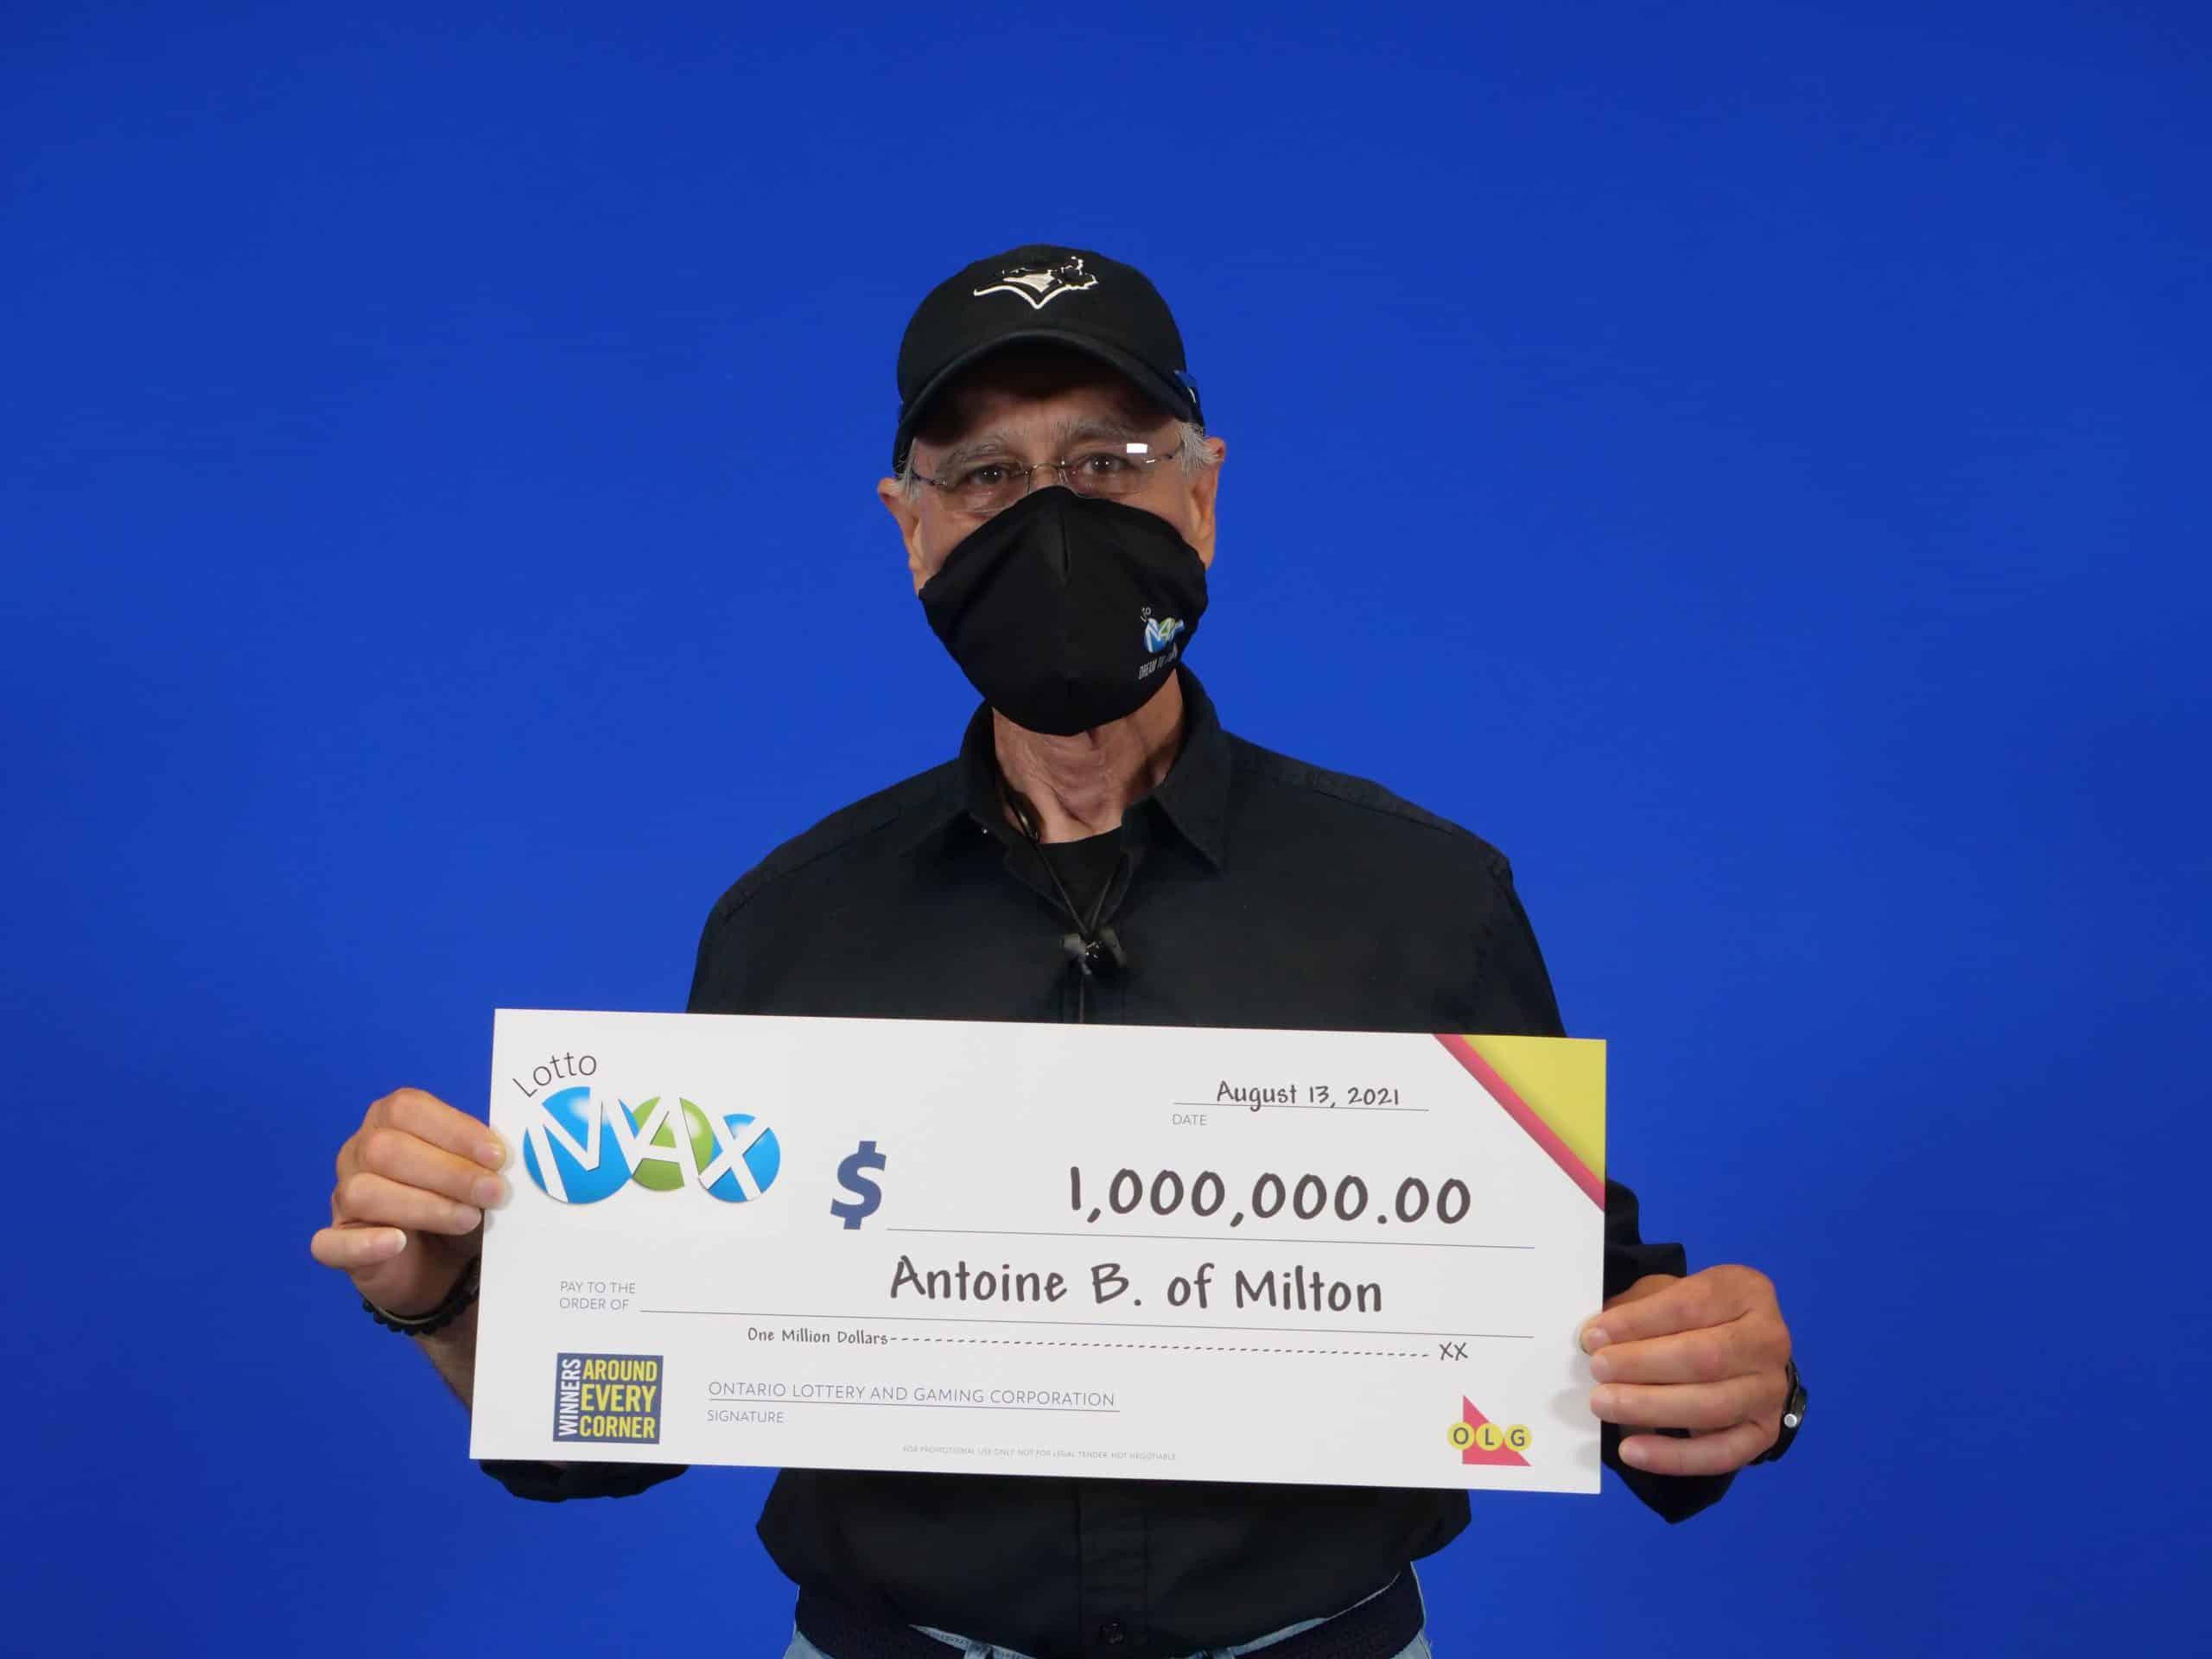 lotto_max_maxmillions_june_18_2021_1000000